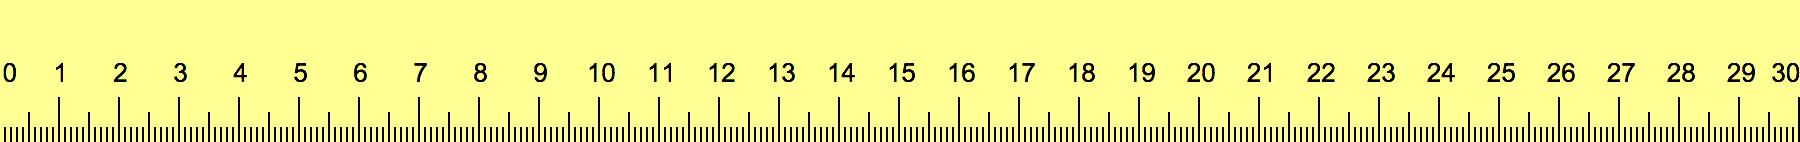 Cm Ruler Actual Size